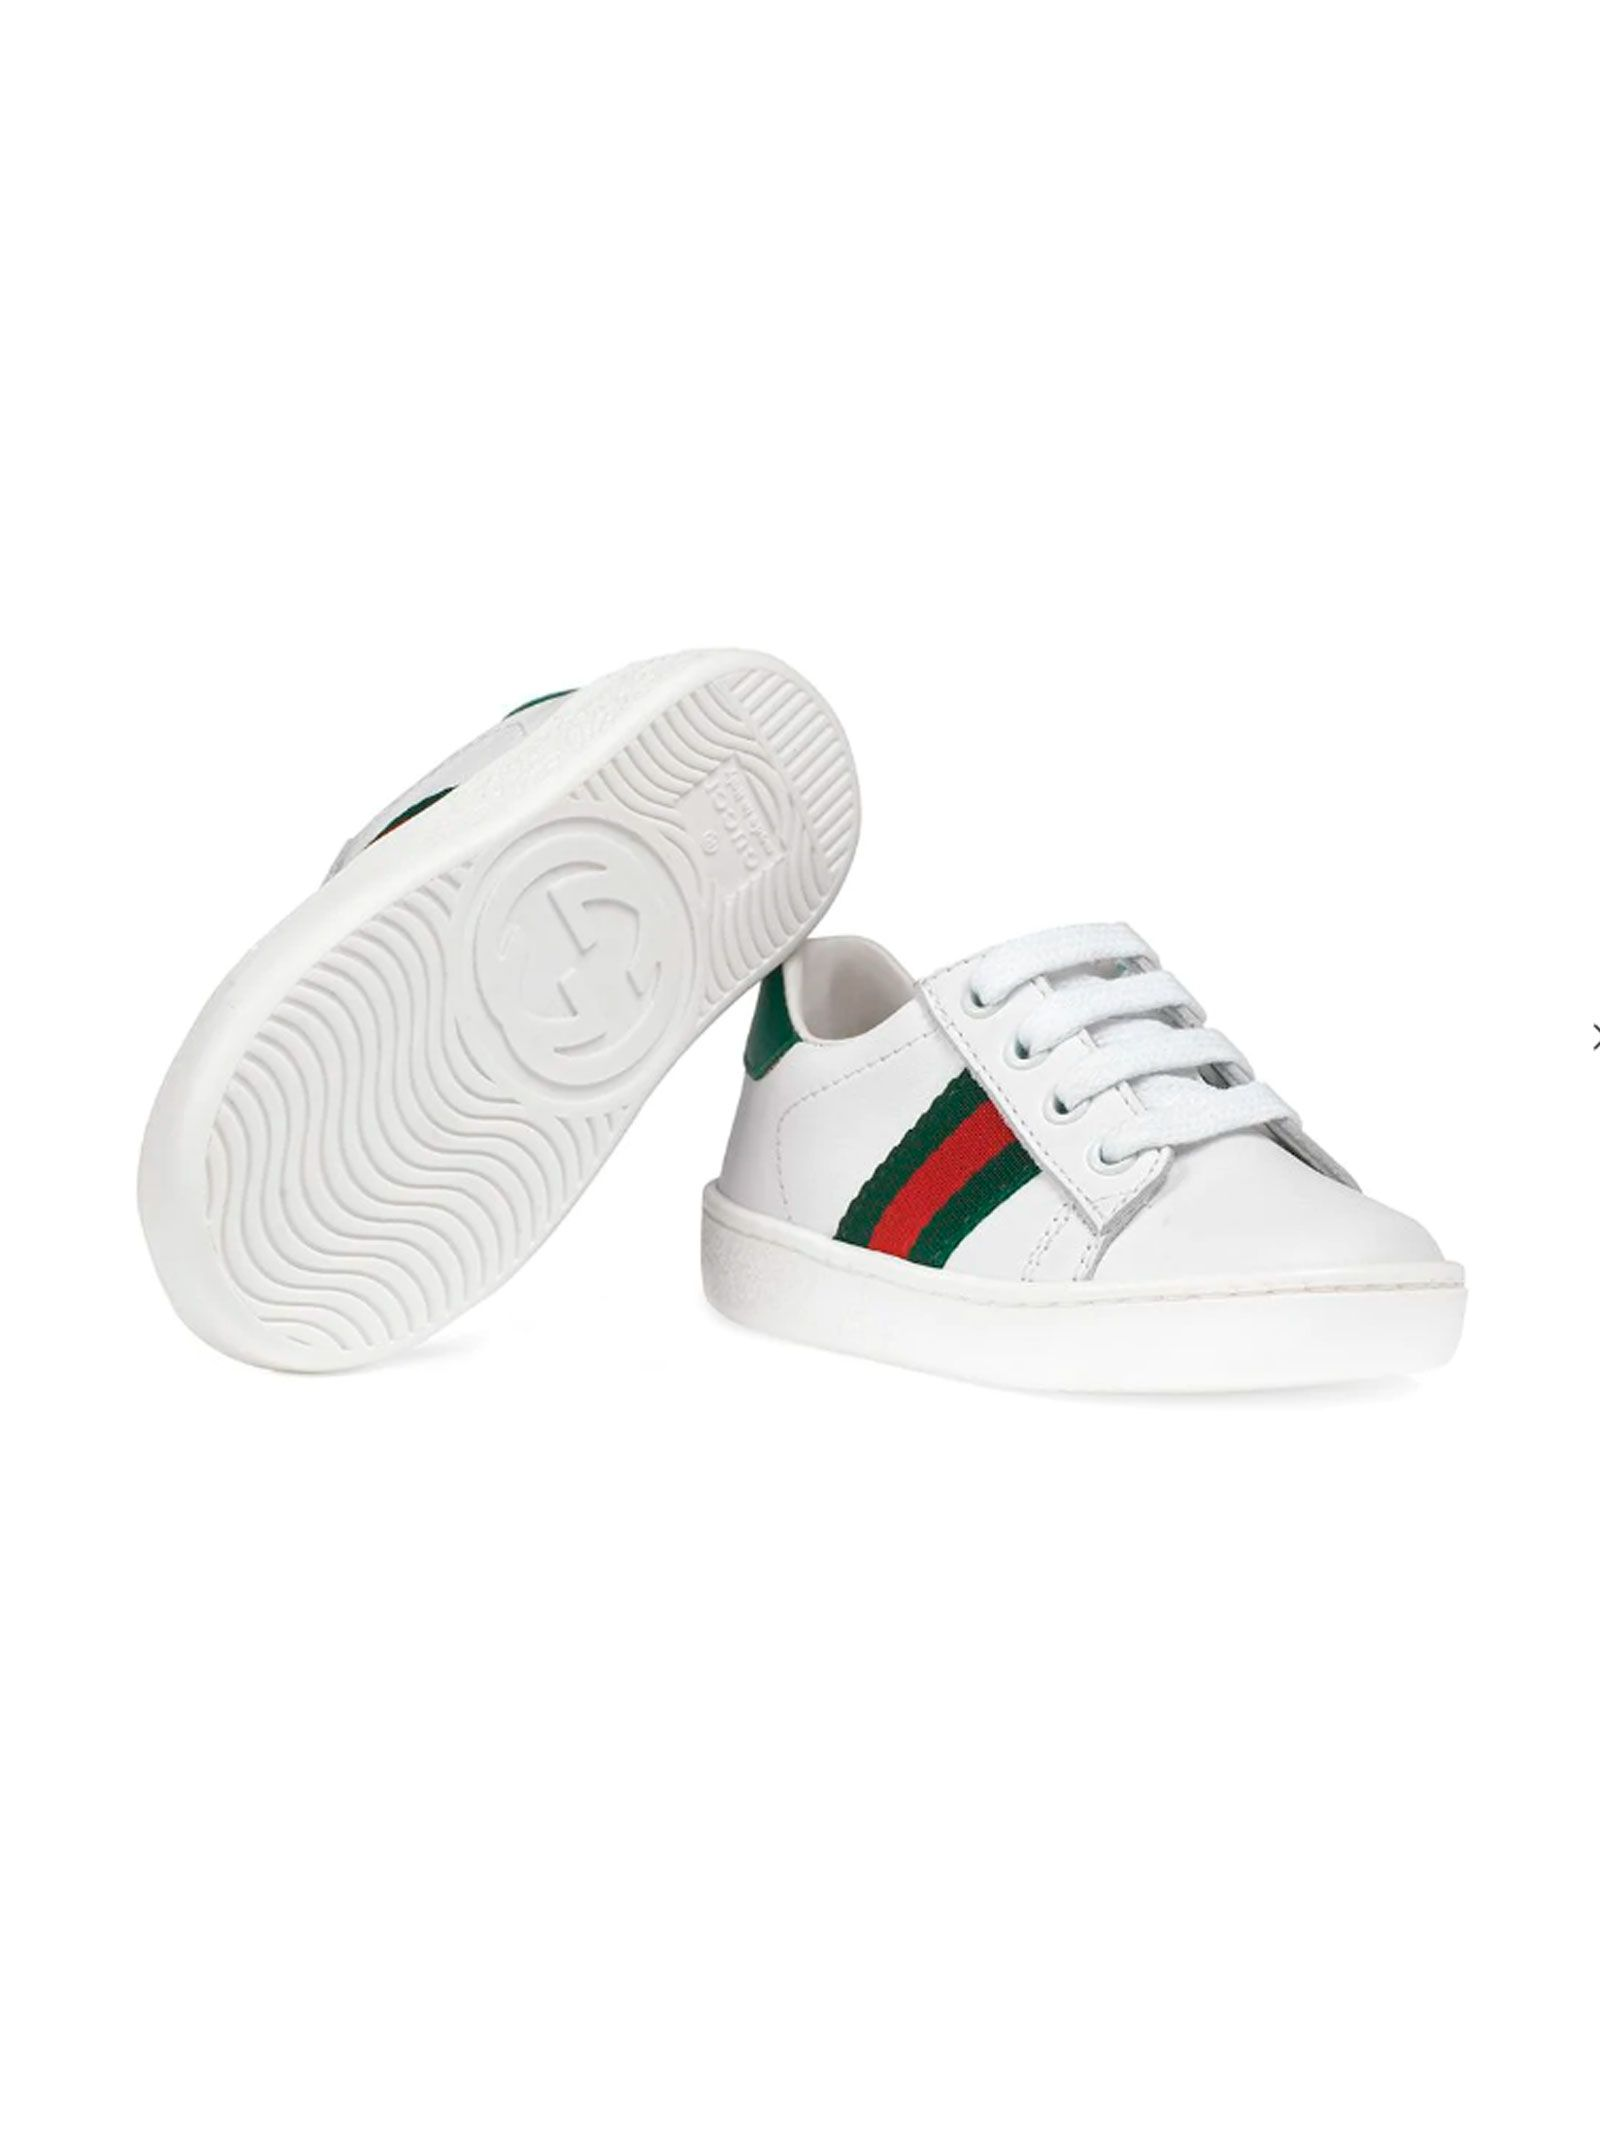 55ecfd326841 Gucci Newborn White Shoes - Basic Gucci Newborn White Shoes - Basic